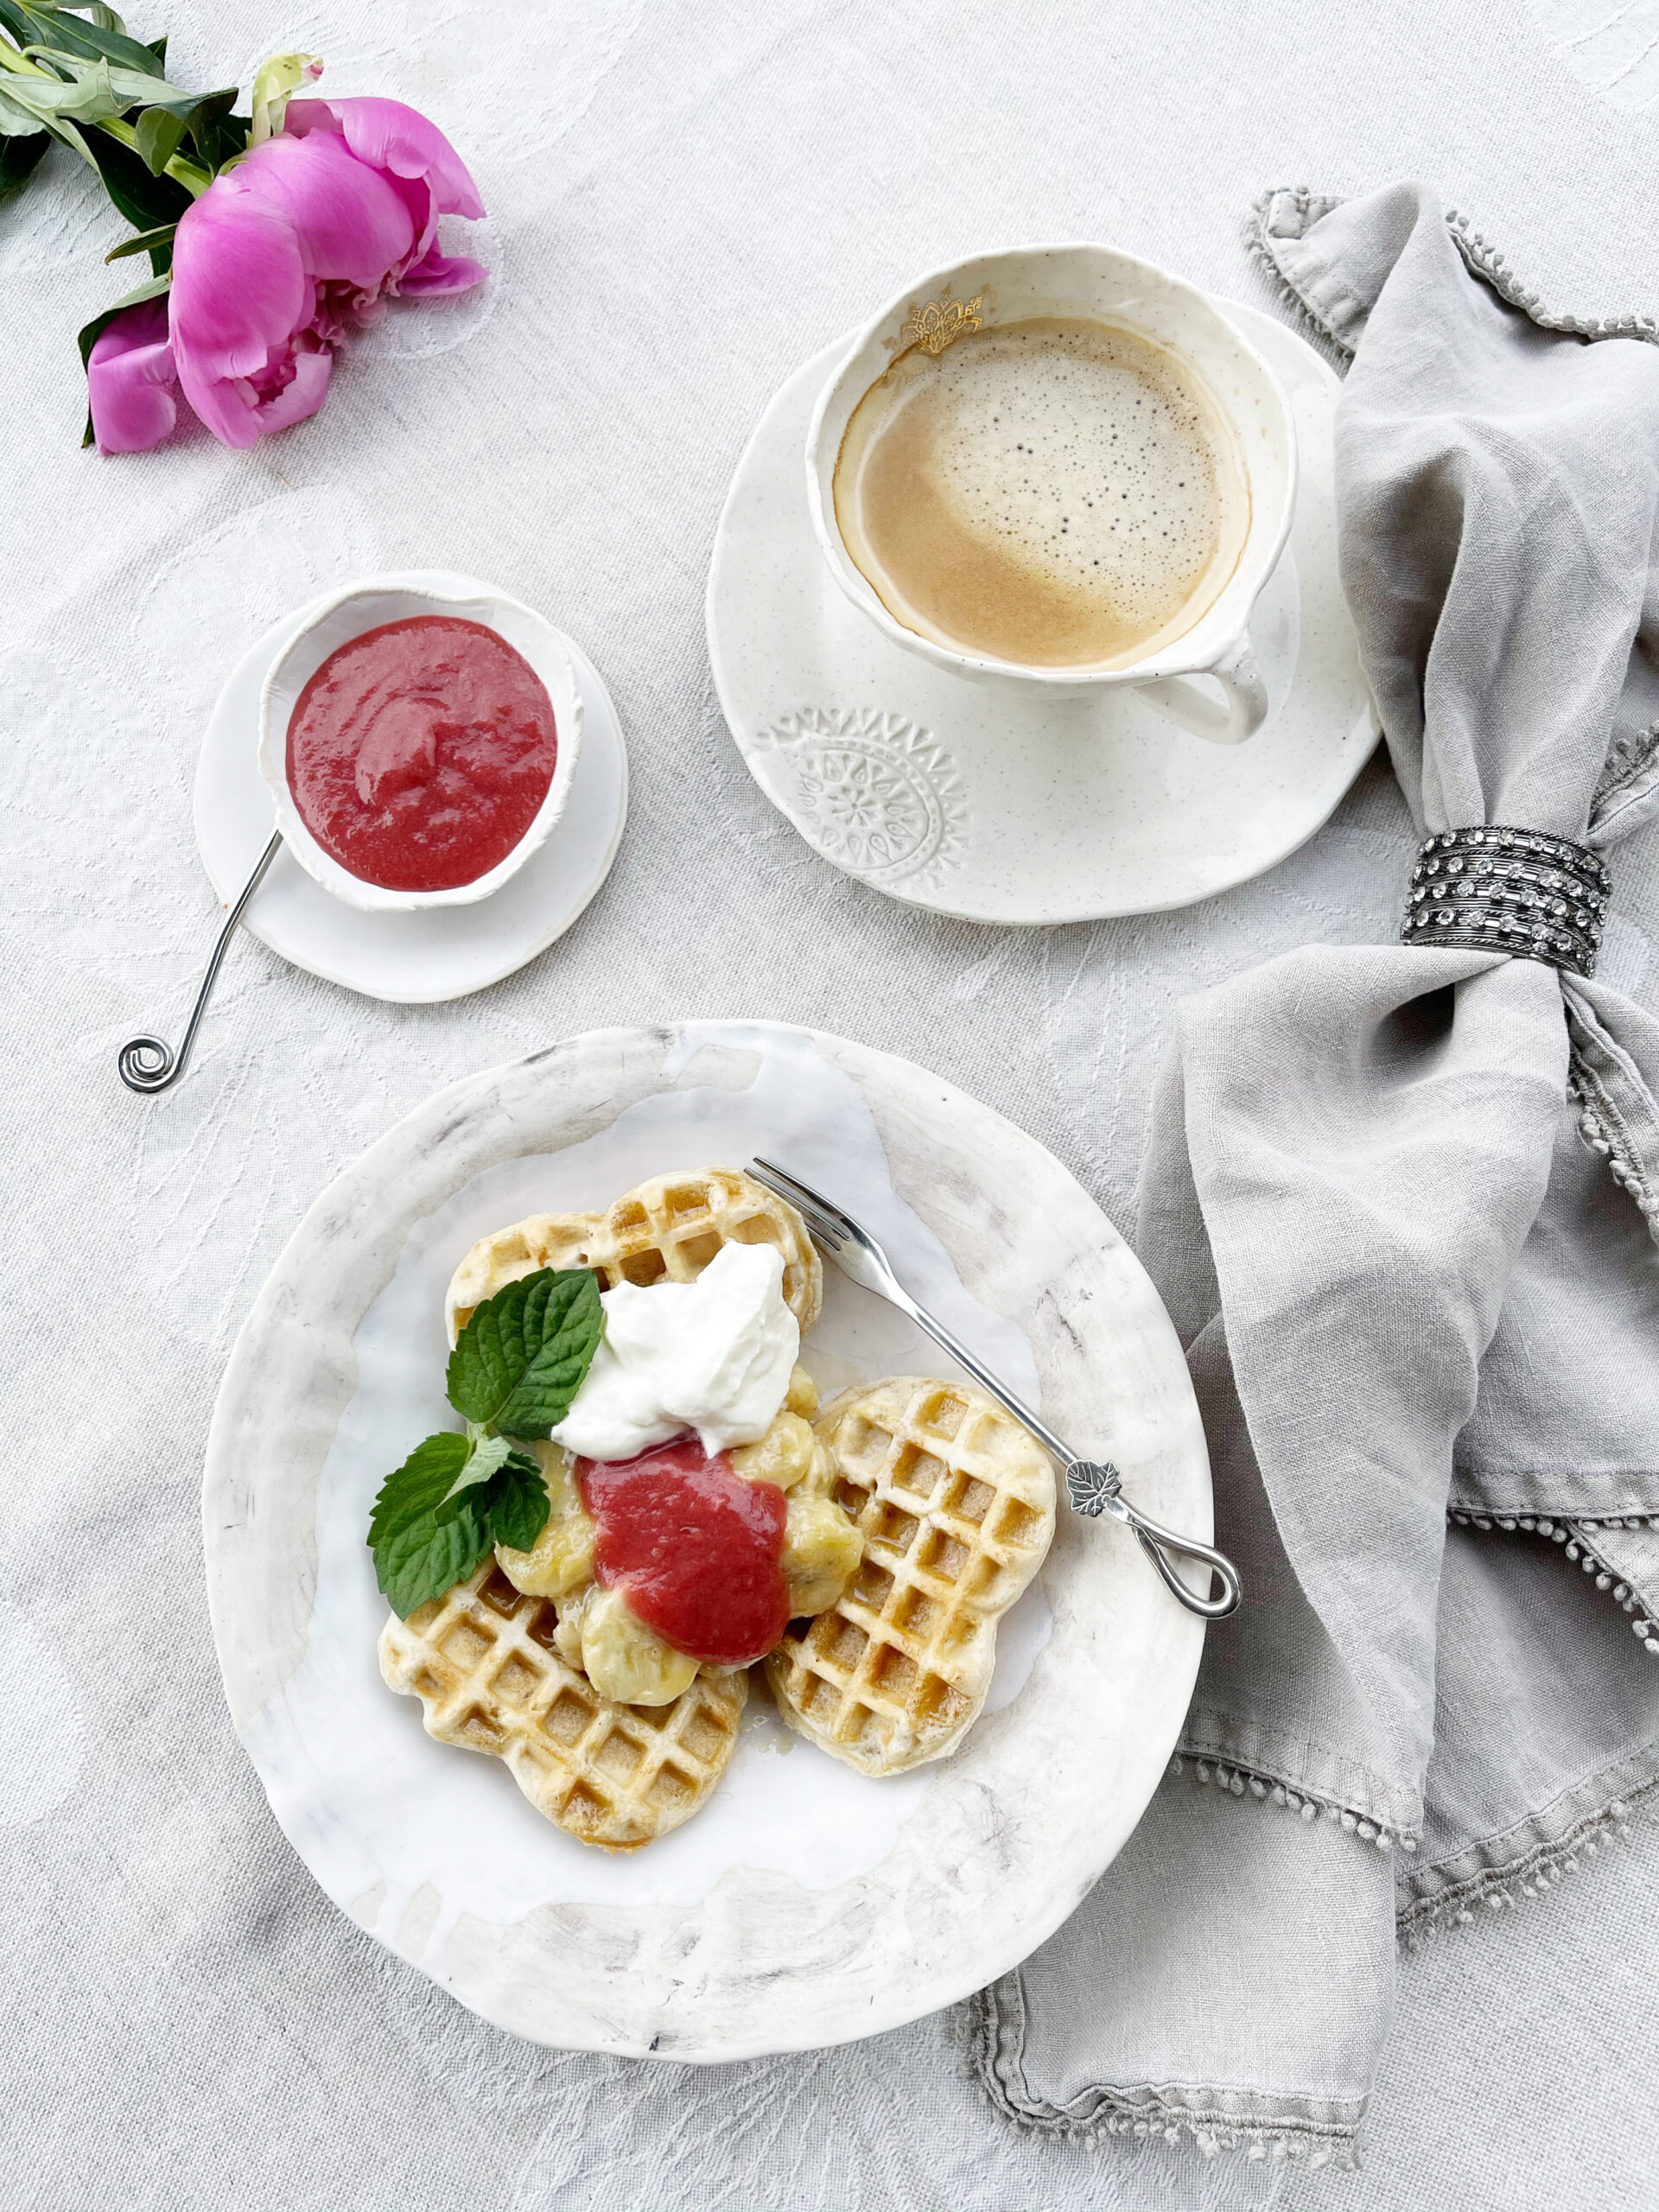 Sourdough Discard Waffles with Oats